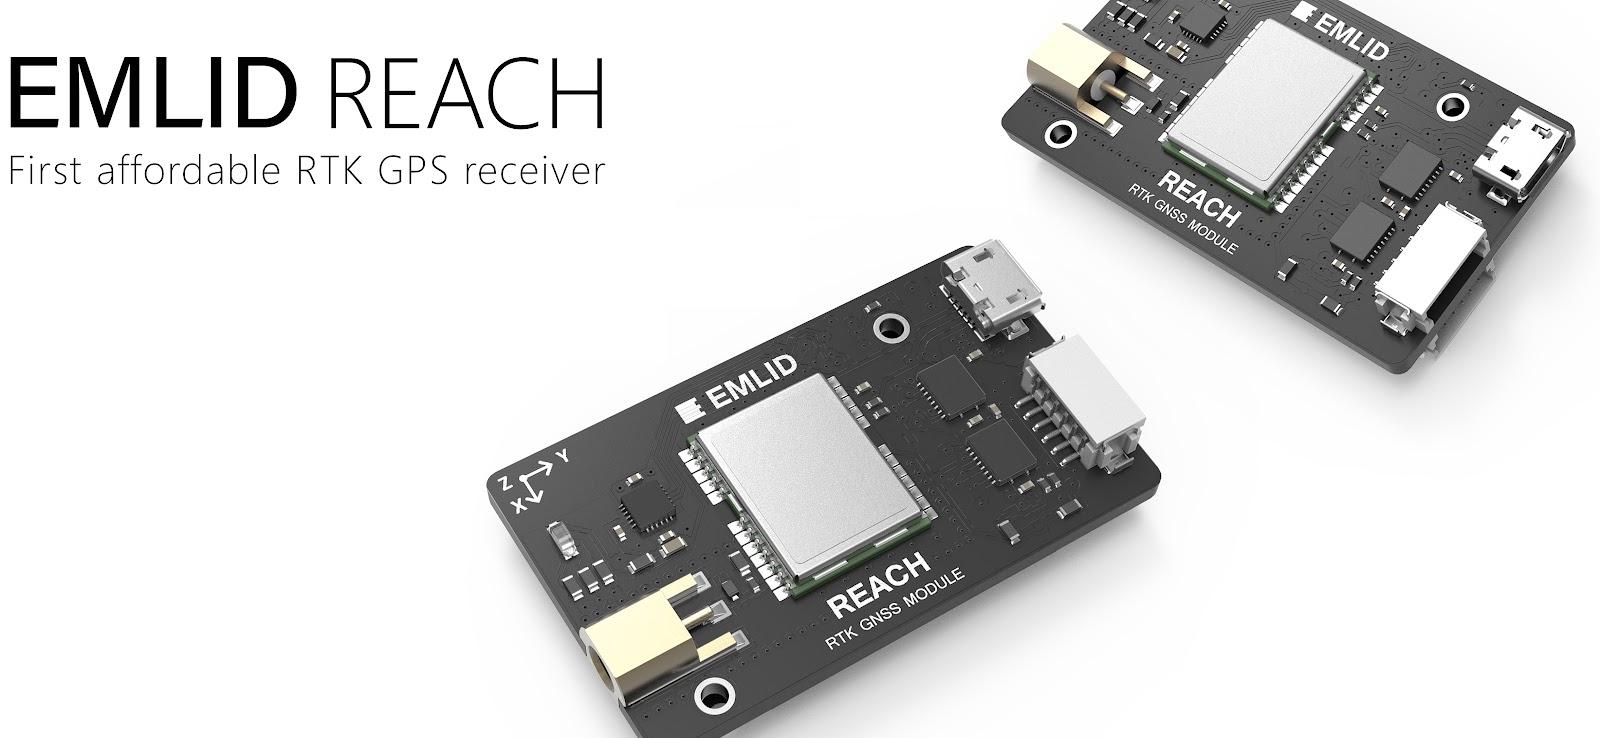 Reach RTK Pixhawk integration released! - DIY Drones